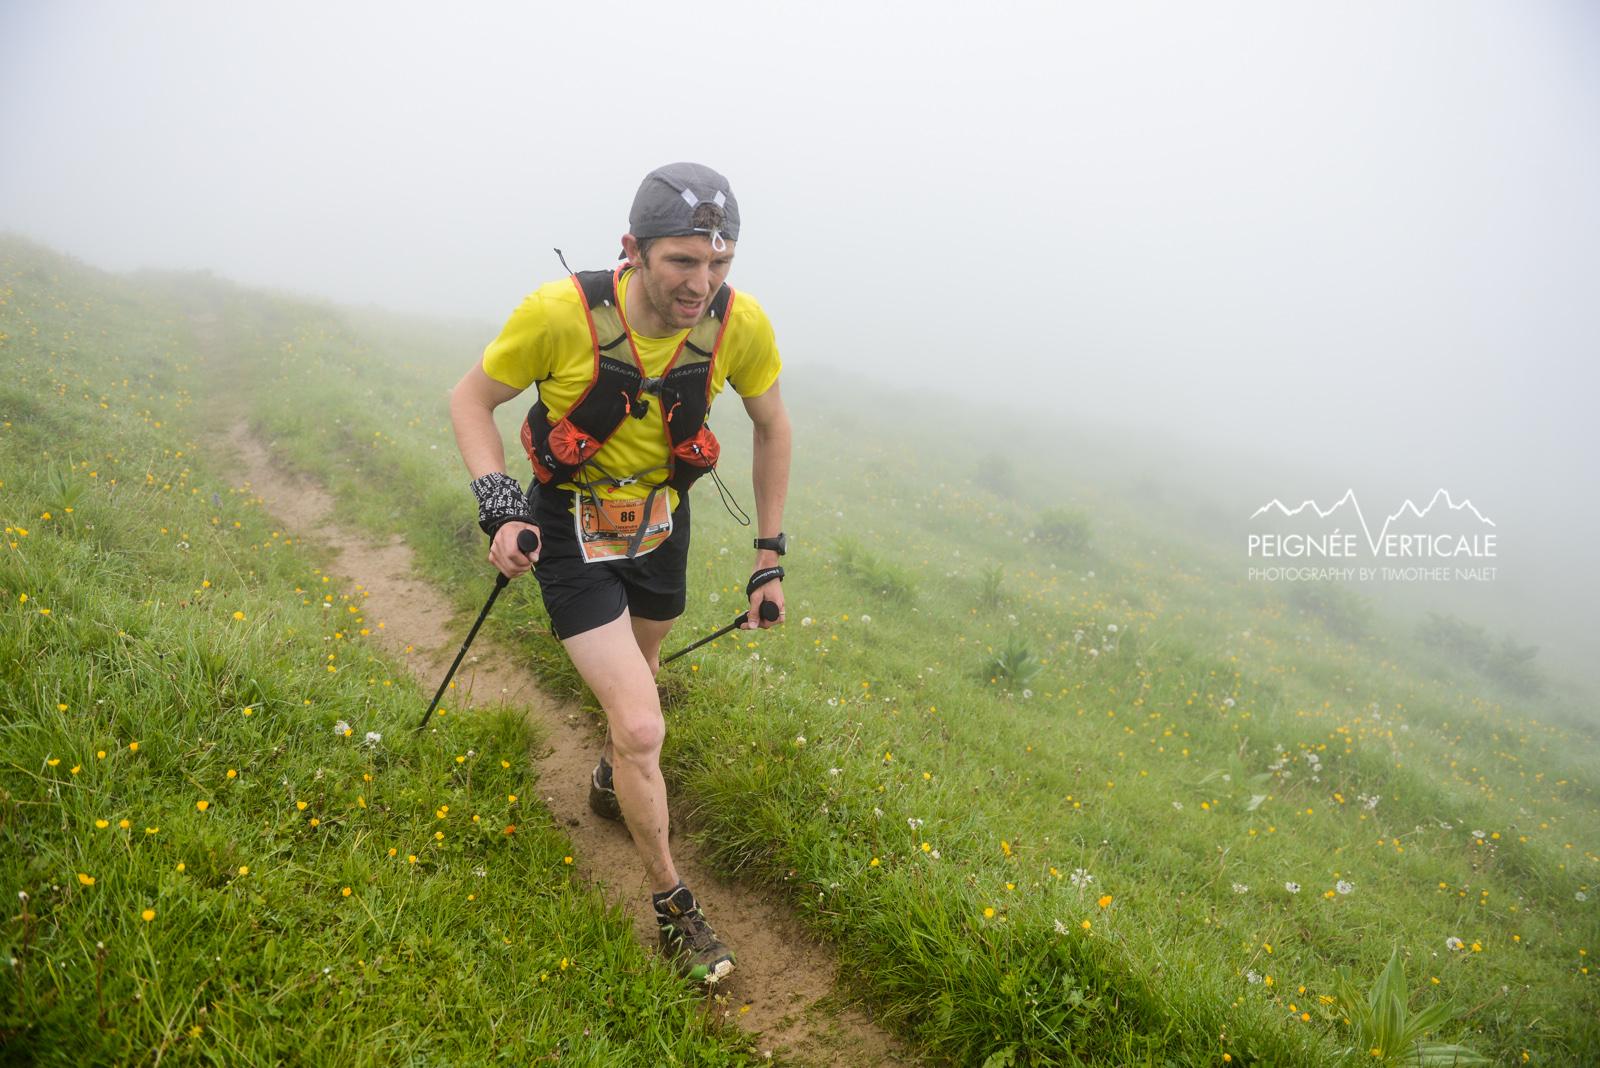 MaxiRace-Annecy-2014-Team-Hoka-Timothee-Nalet-1113.jpg